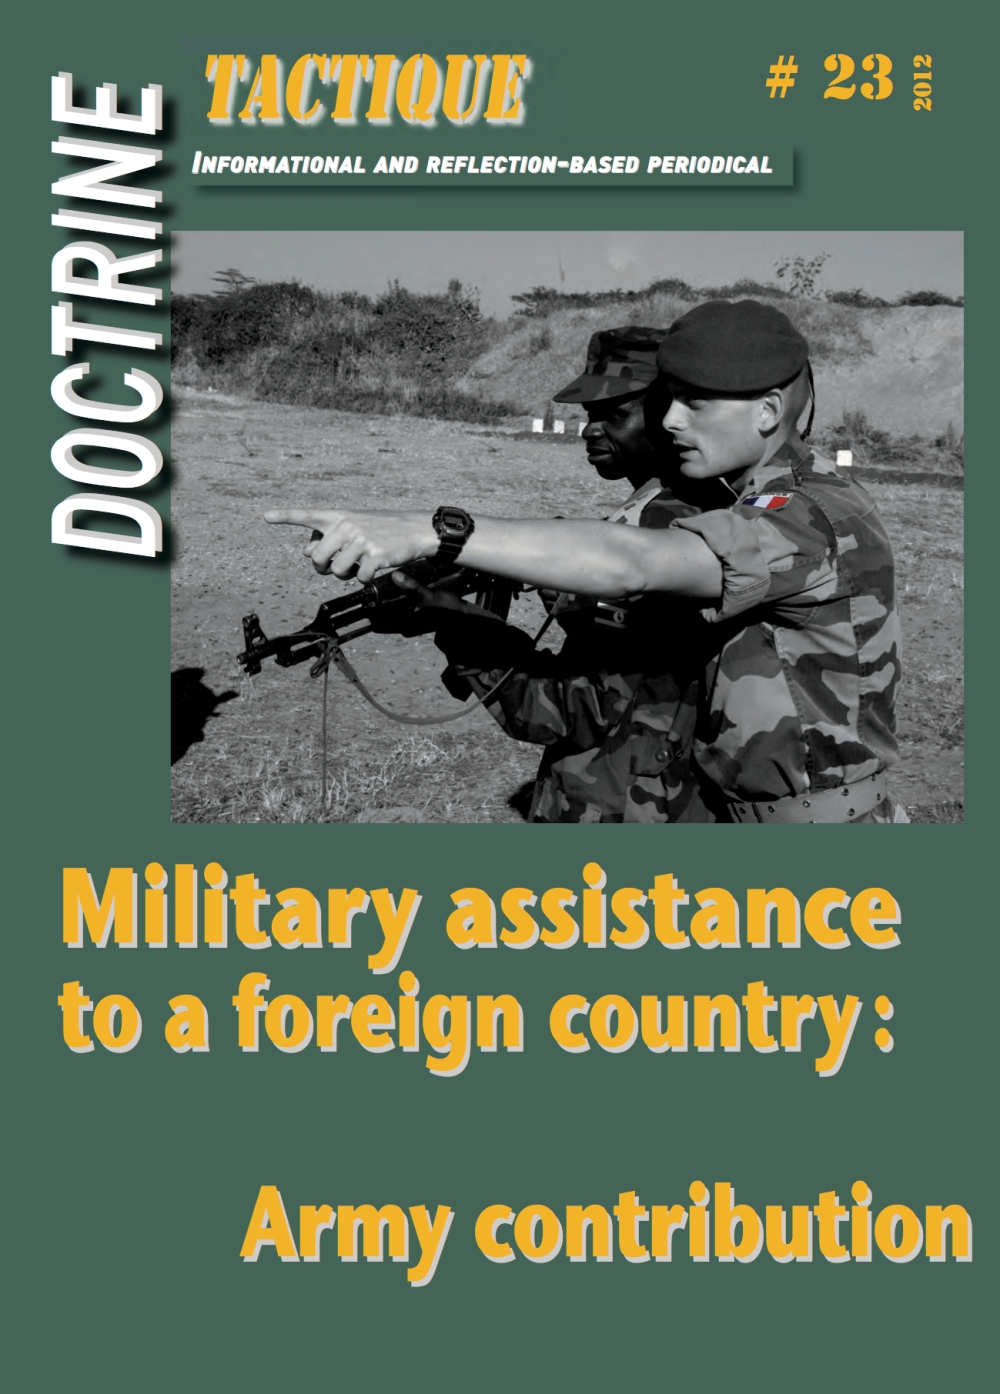 Doctrine magazine